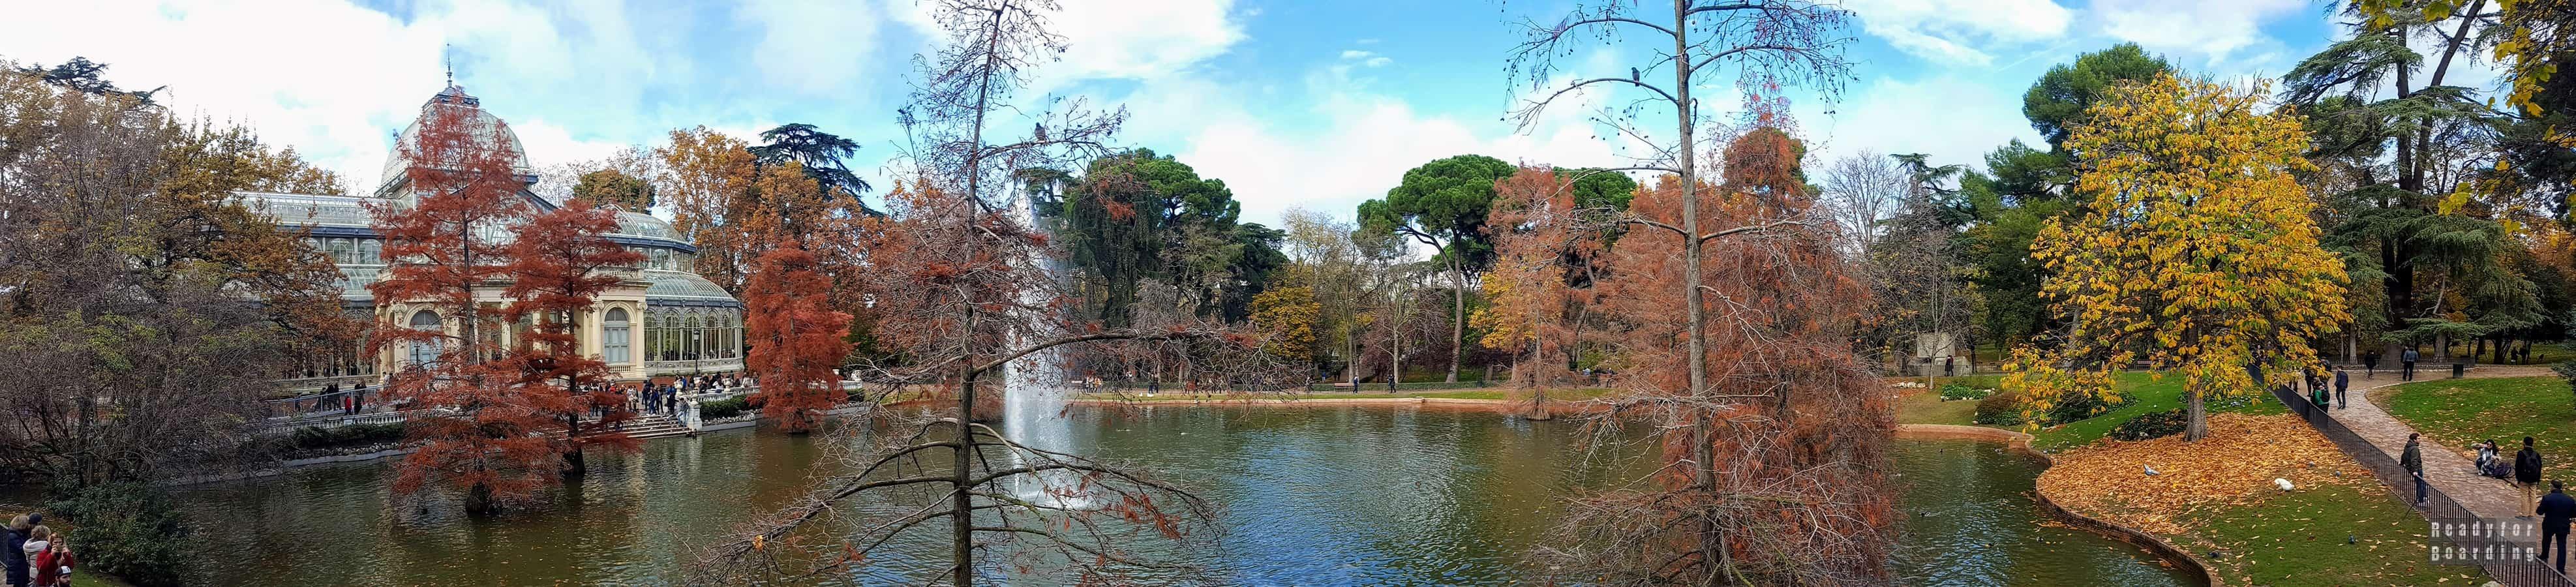 Panorama: Park Retiro, Madryt - Hiszpania